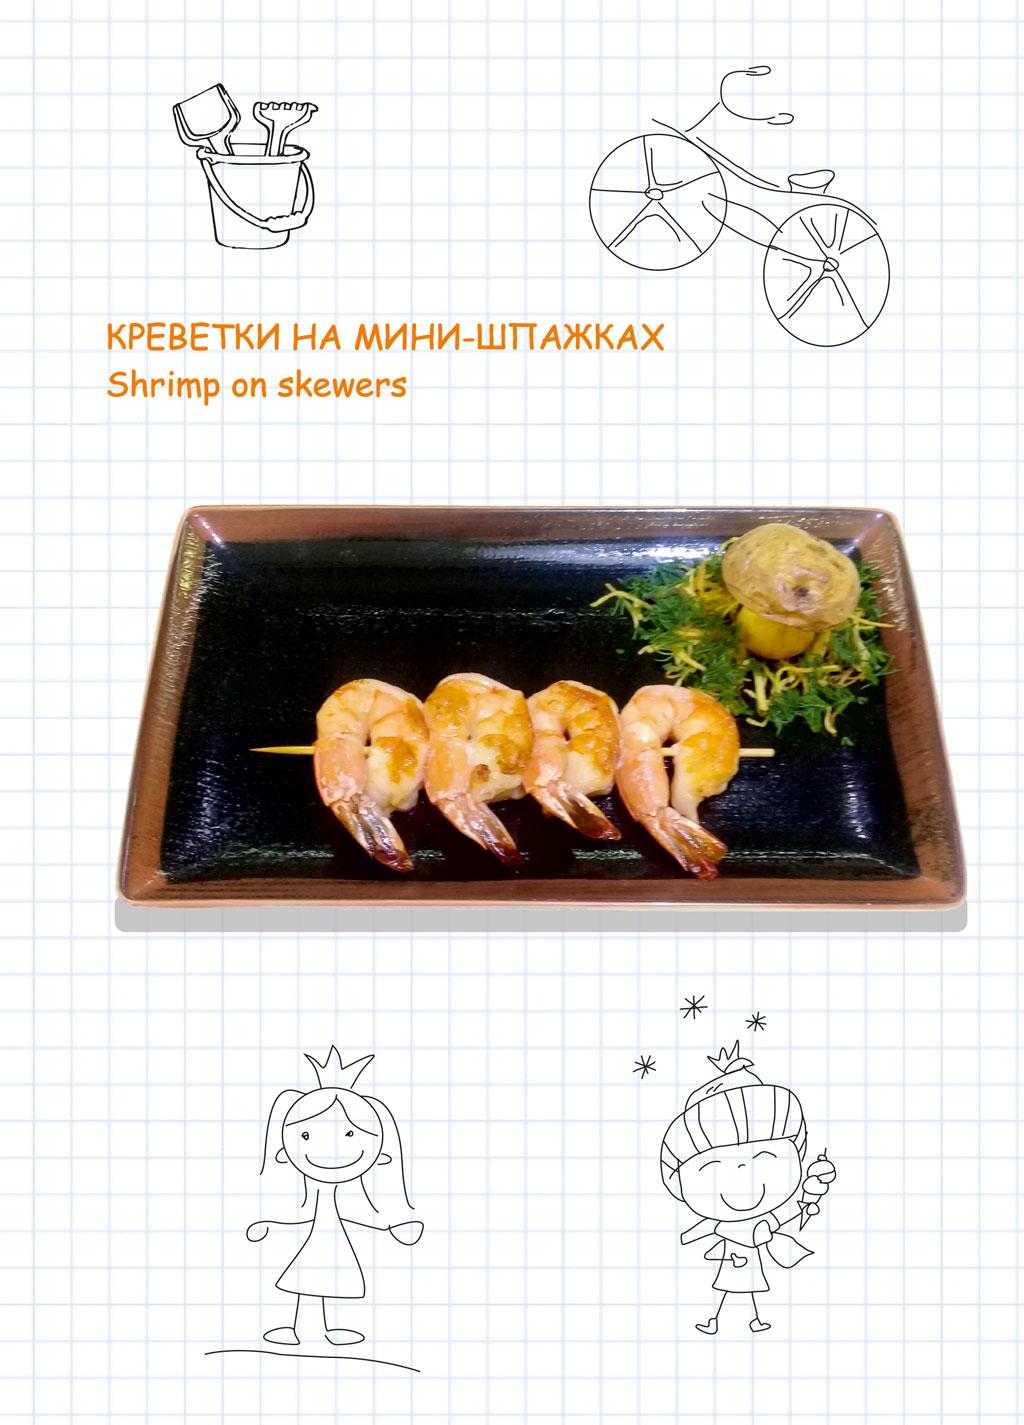 Креветки на мини-шпажках (Shrimp on skewers) в ресторане Аннам Брахма в Оренбурге